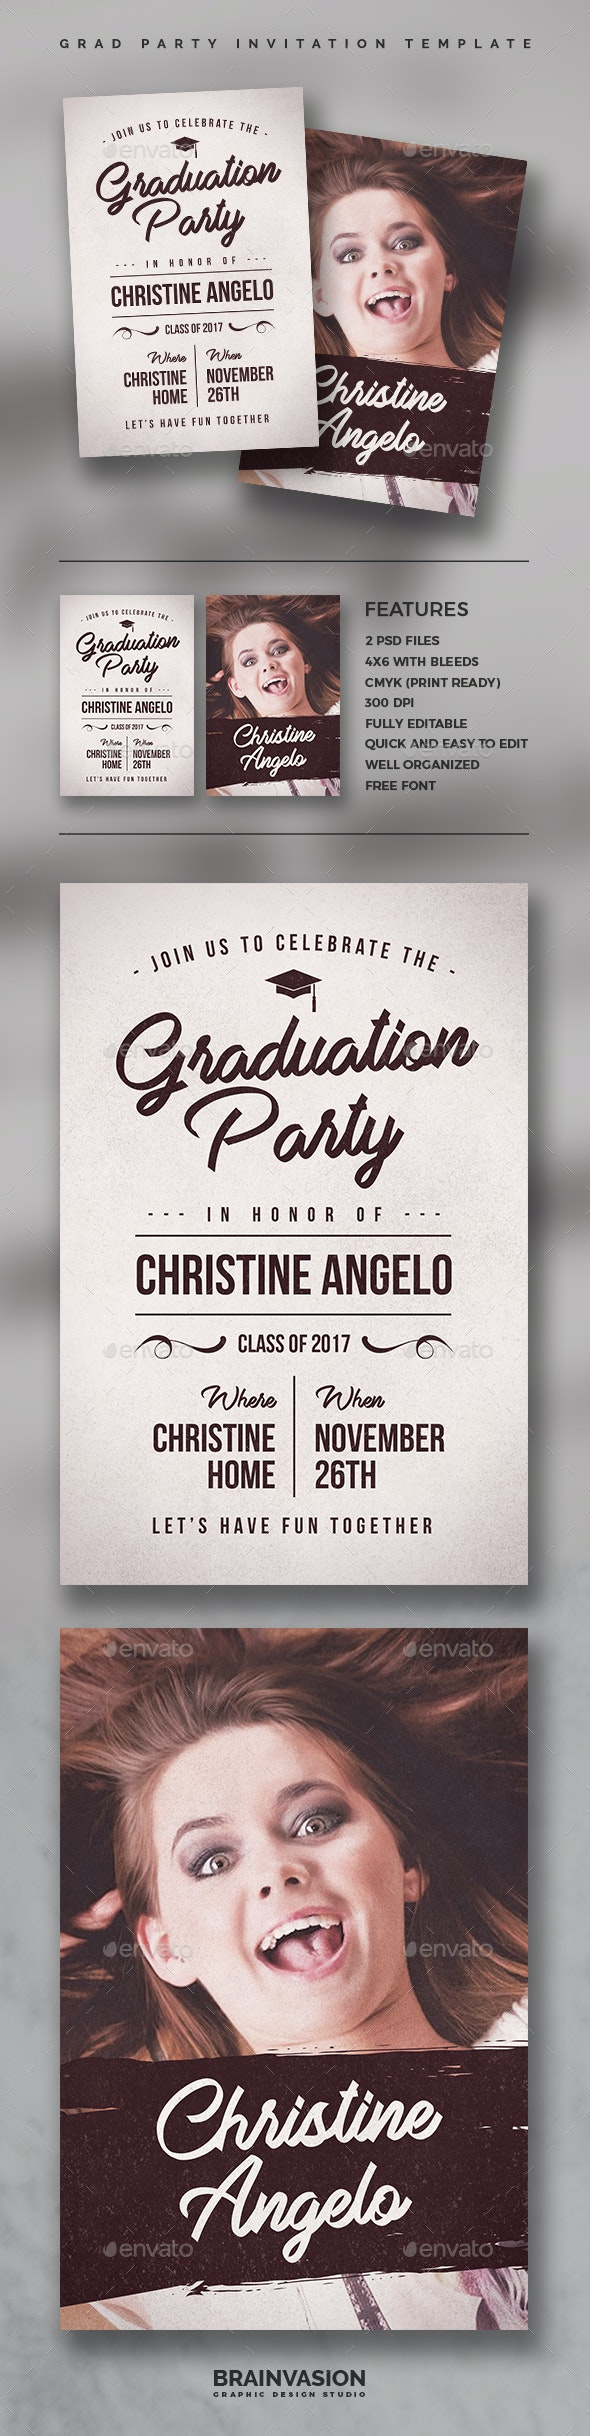 Graduation Party Invitation Template - Invitations Cards & Invites